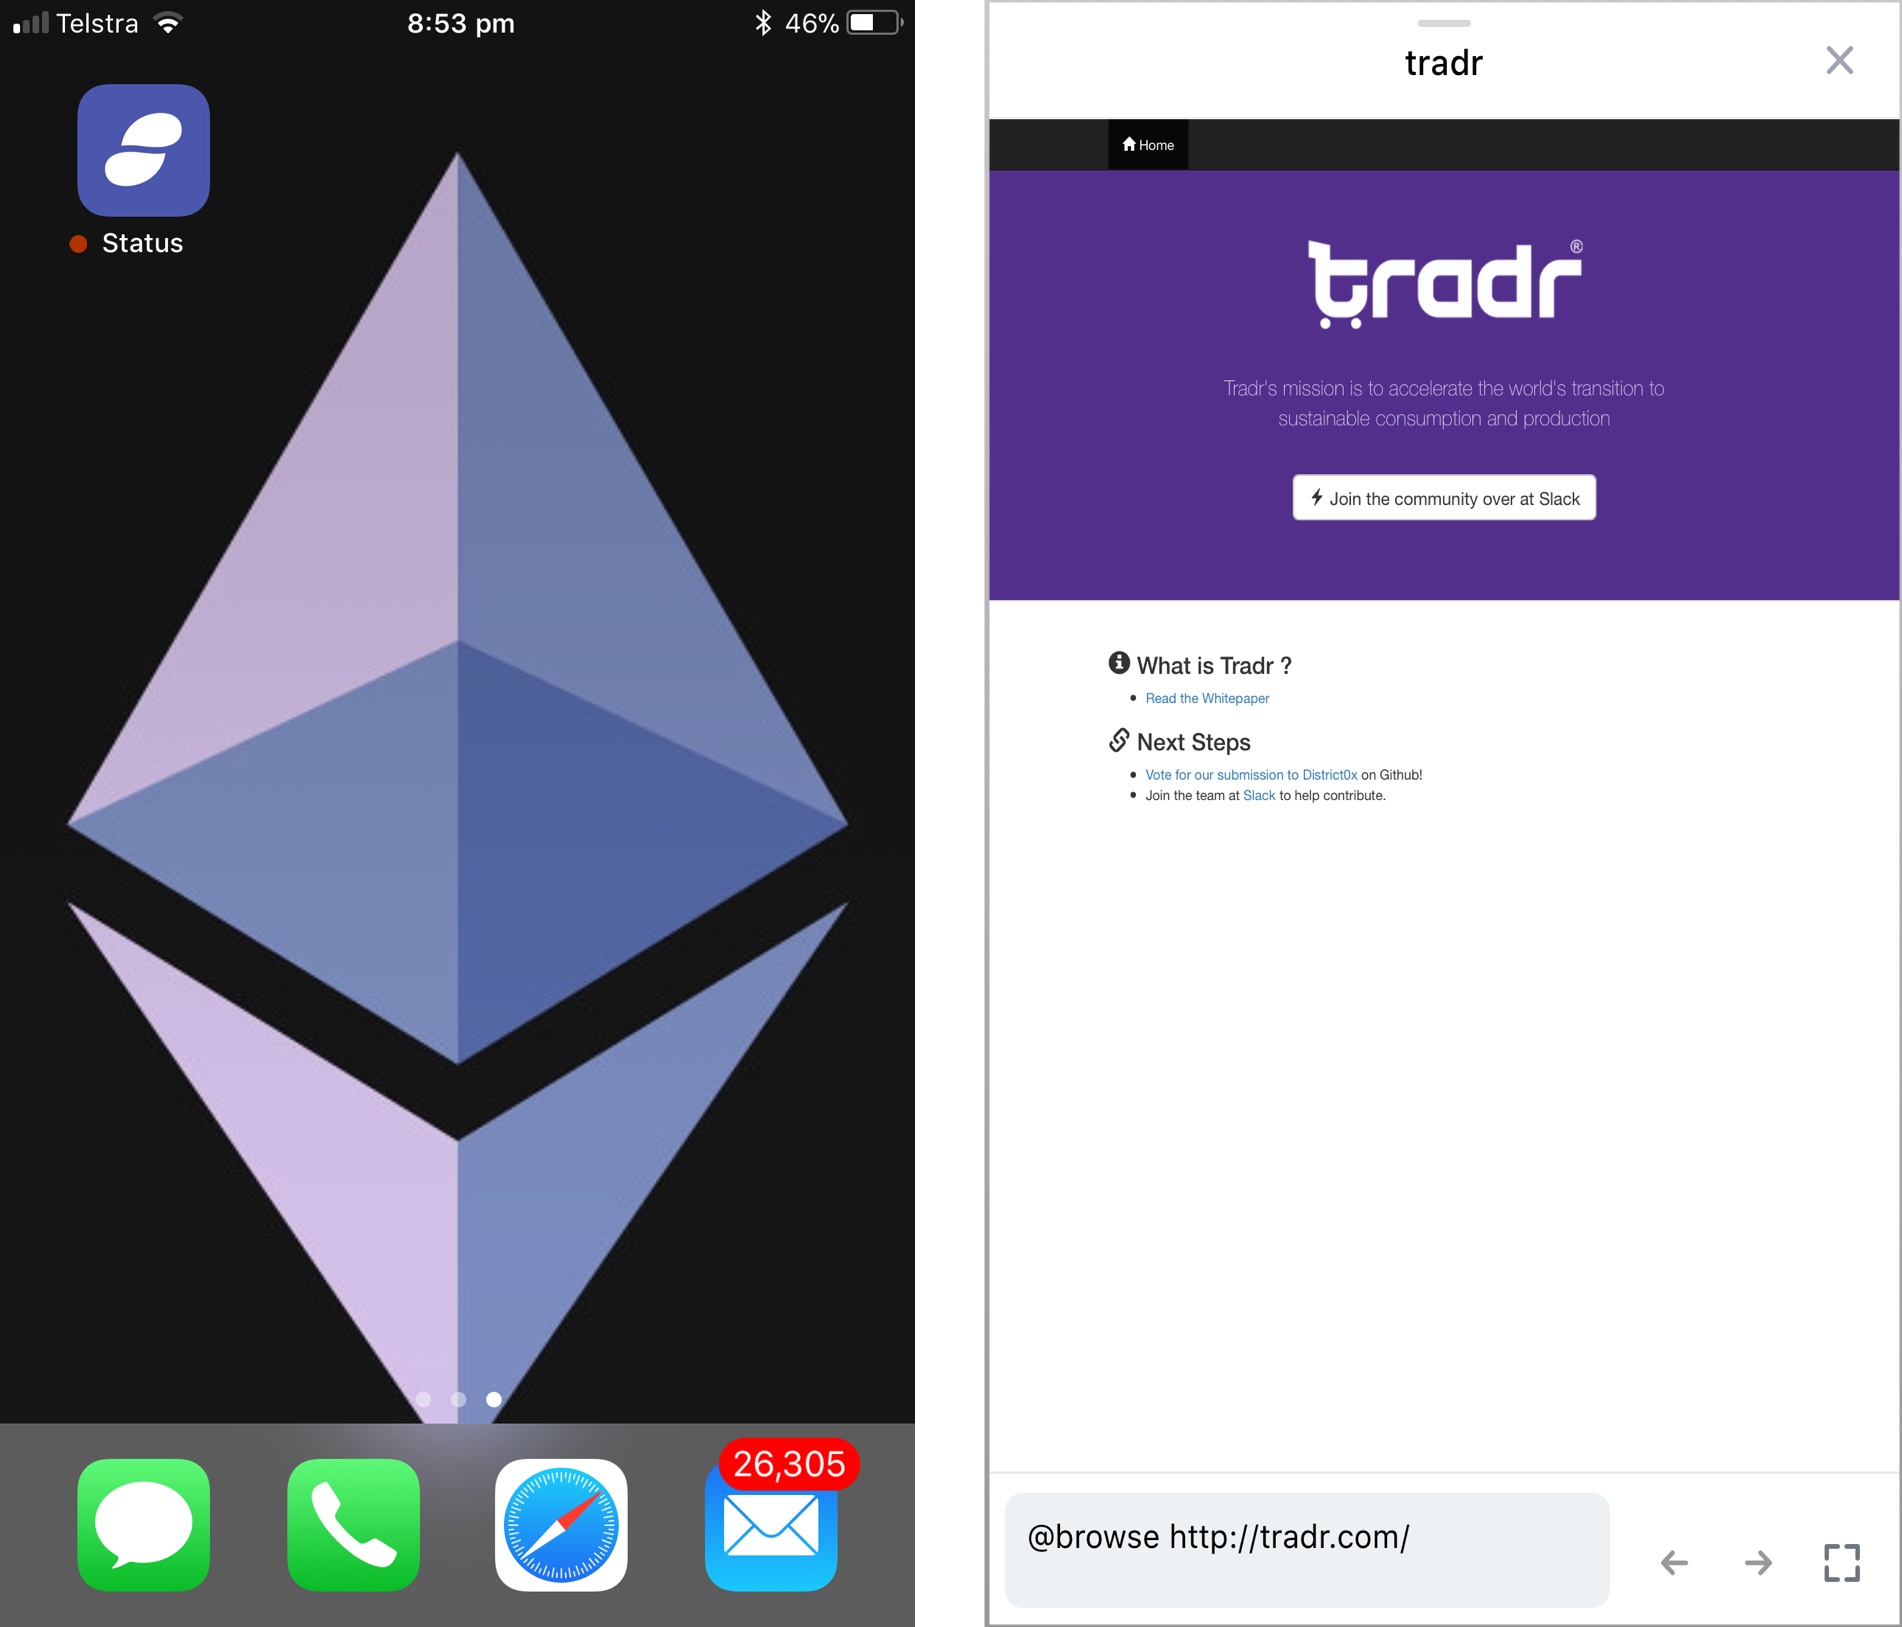 tradr-status-dapp-icon-and-browser